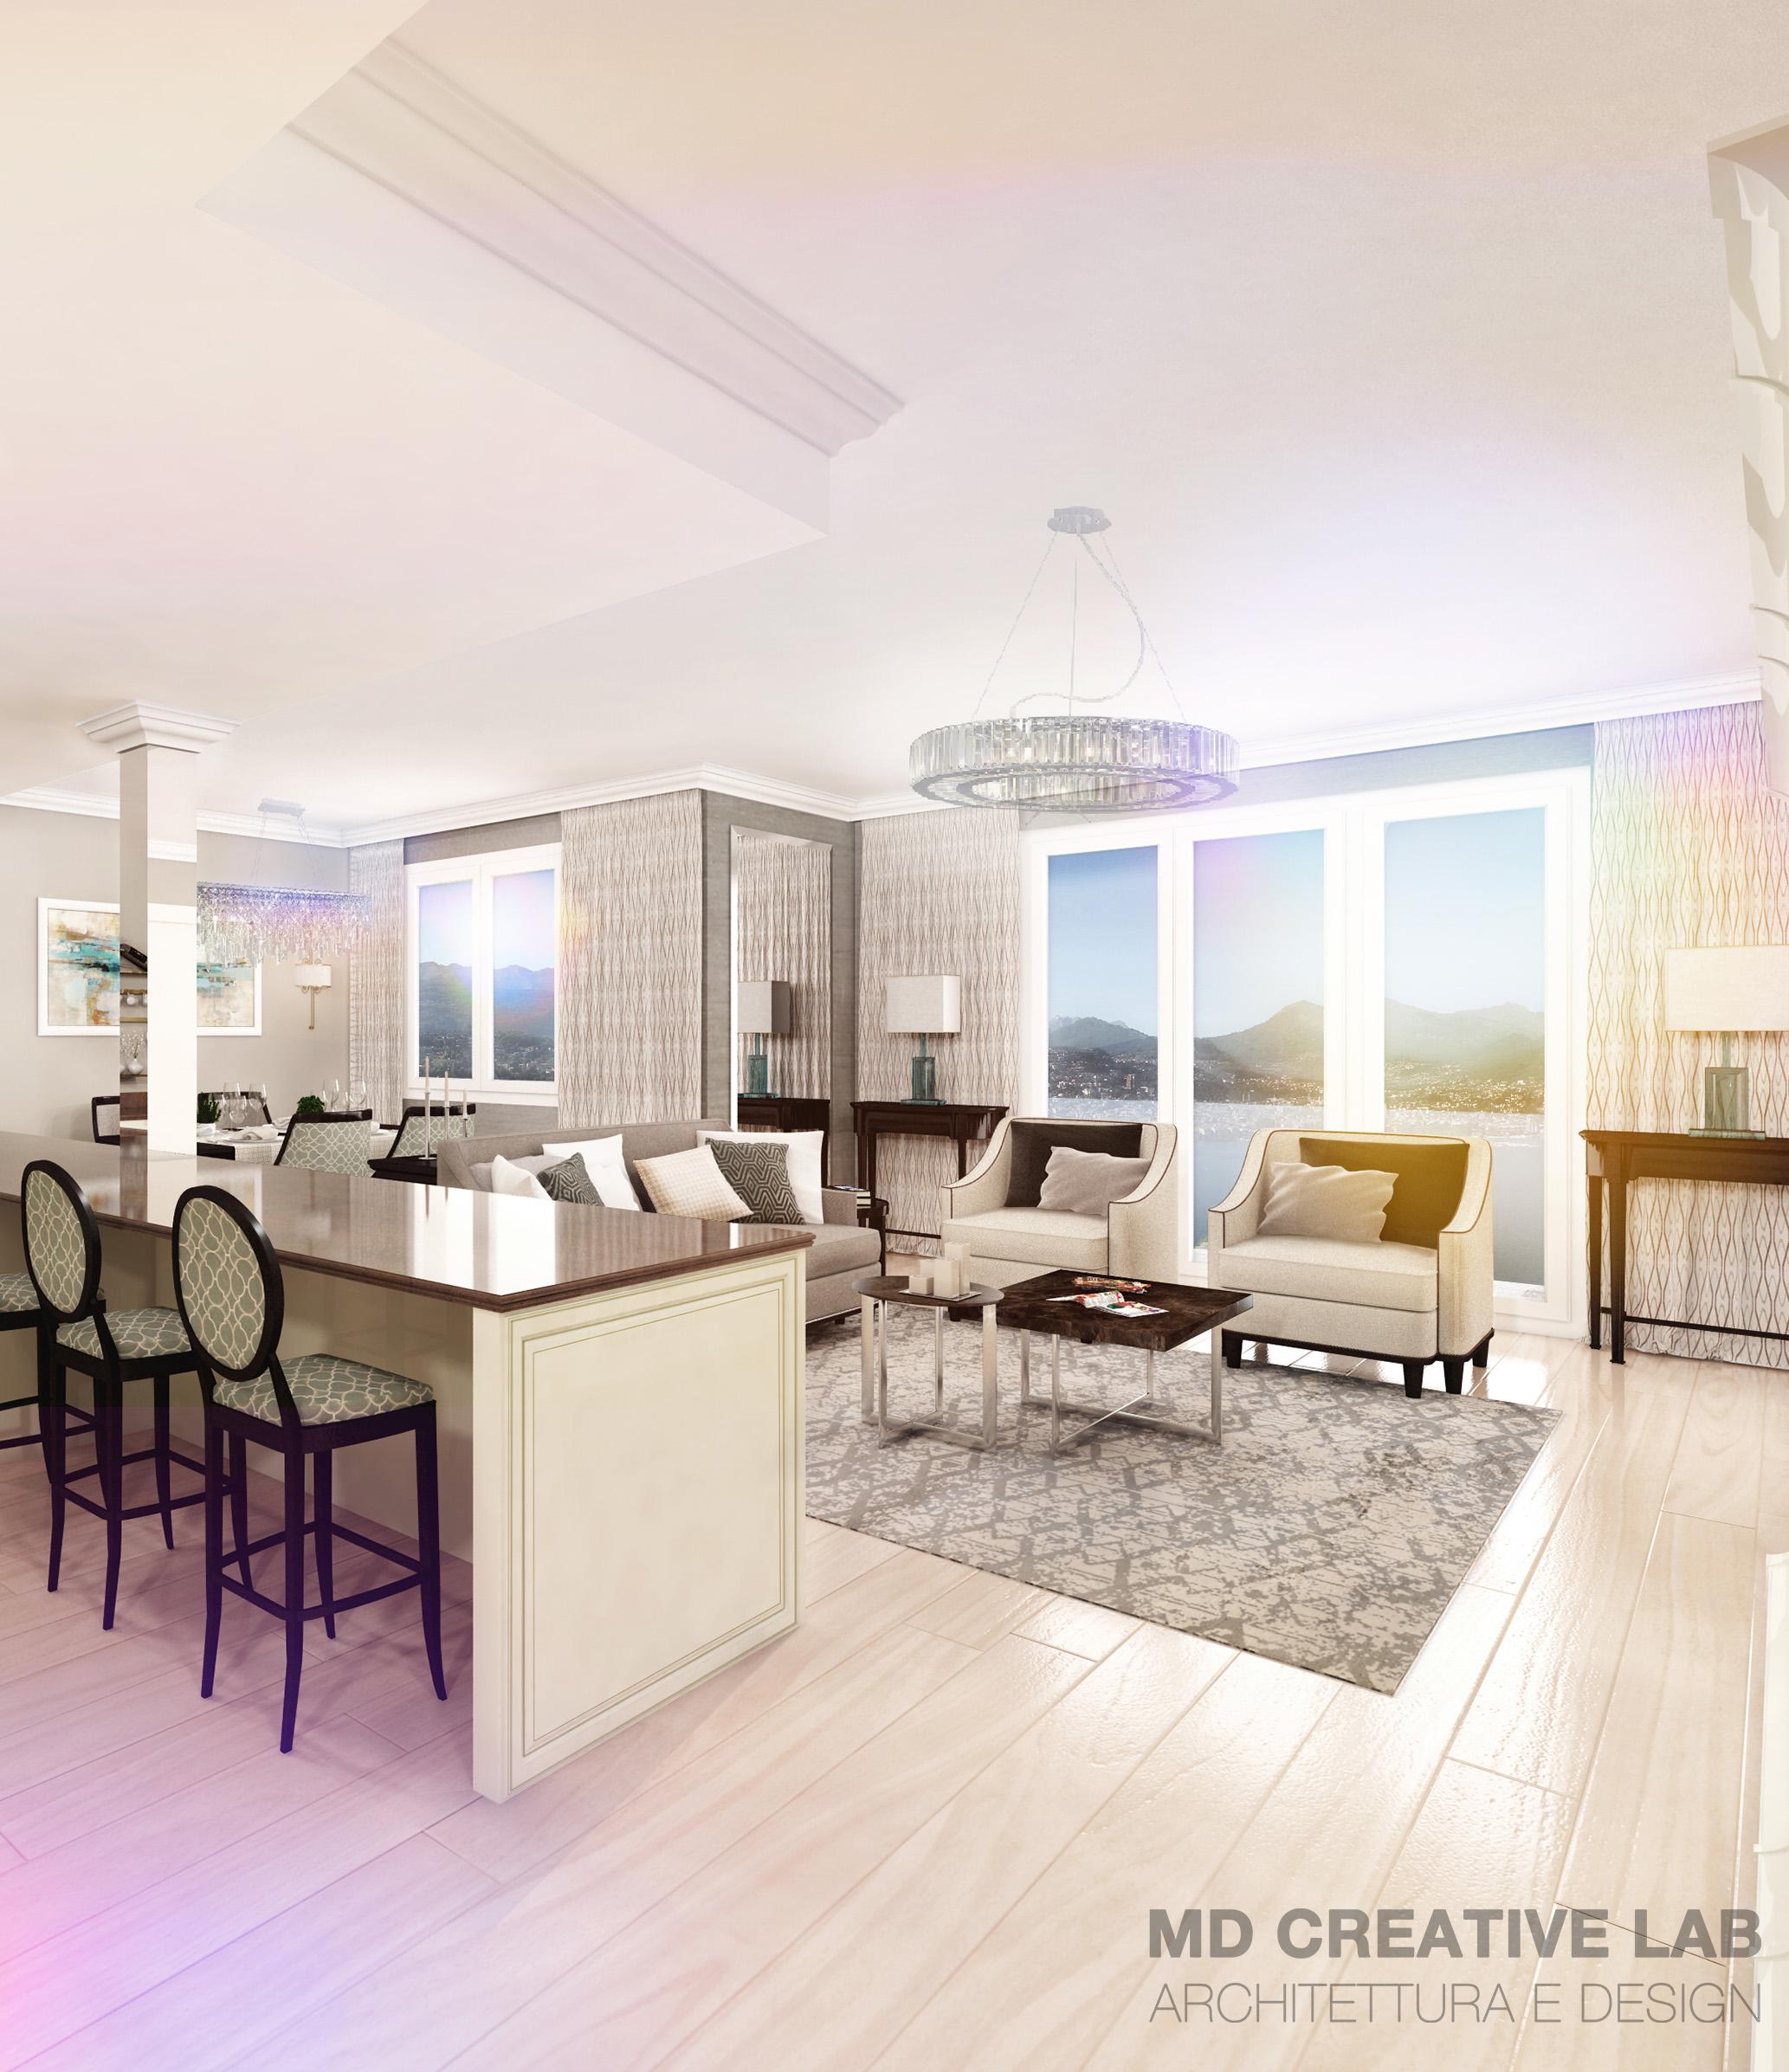 MD Creative Lab Lugano Interior Design Living room Kitchen Emerlad Living Lugano Paradiso vertical